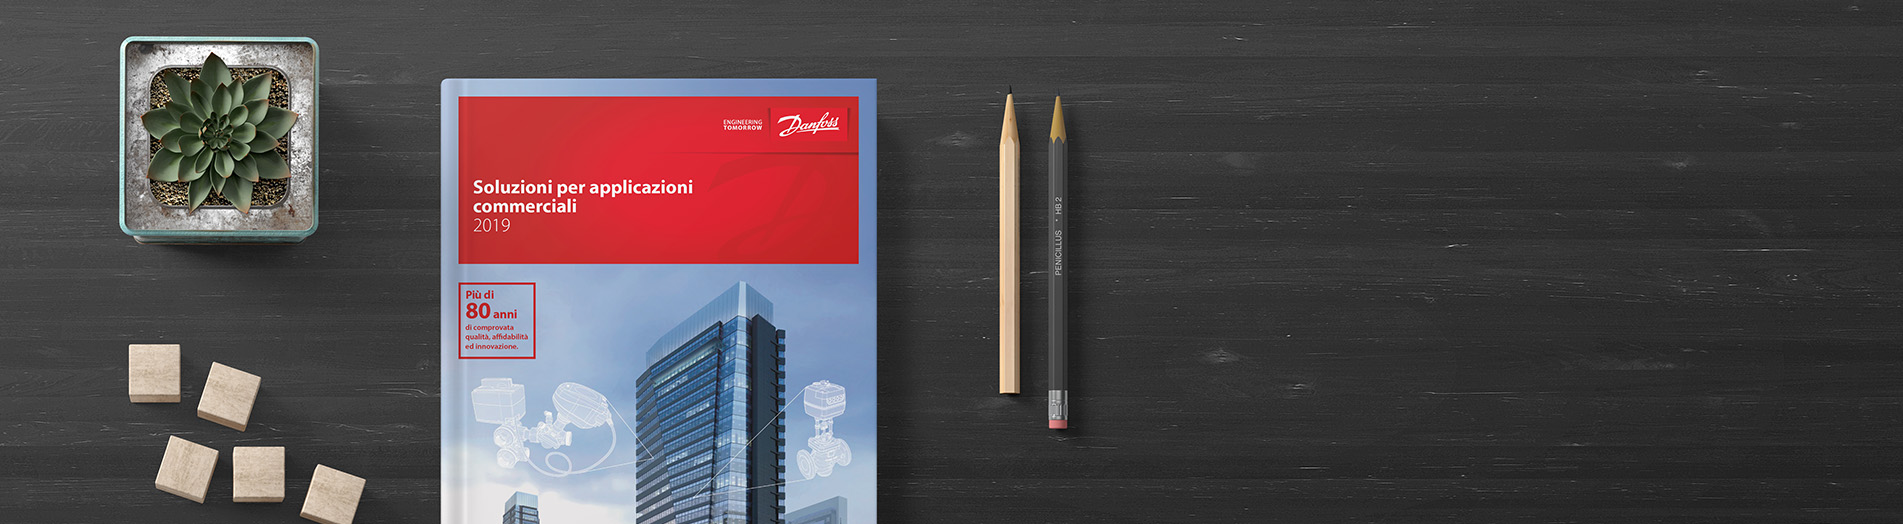 slider-danfoss-progettazione-2019